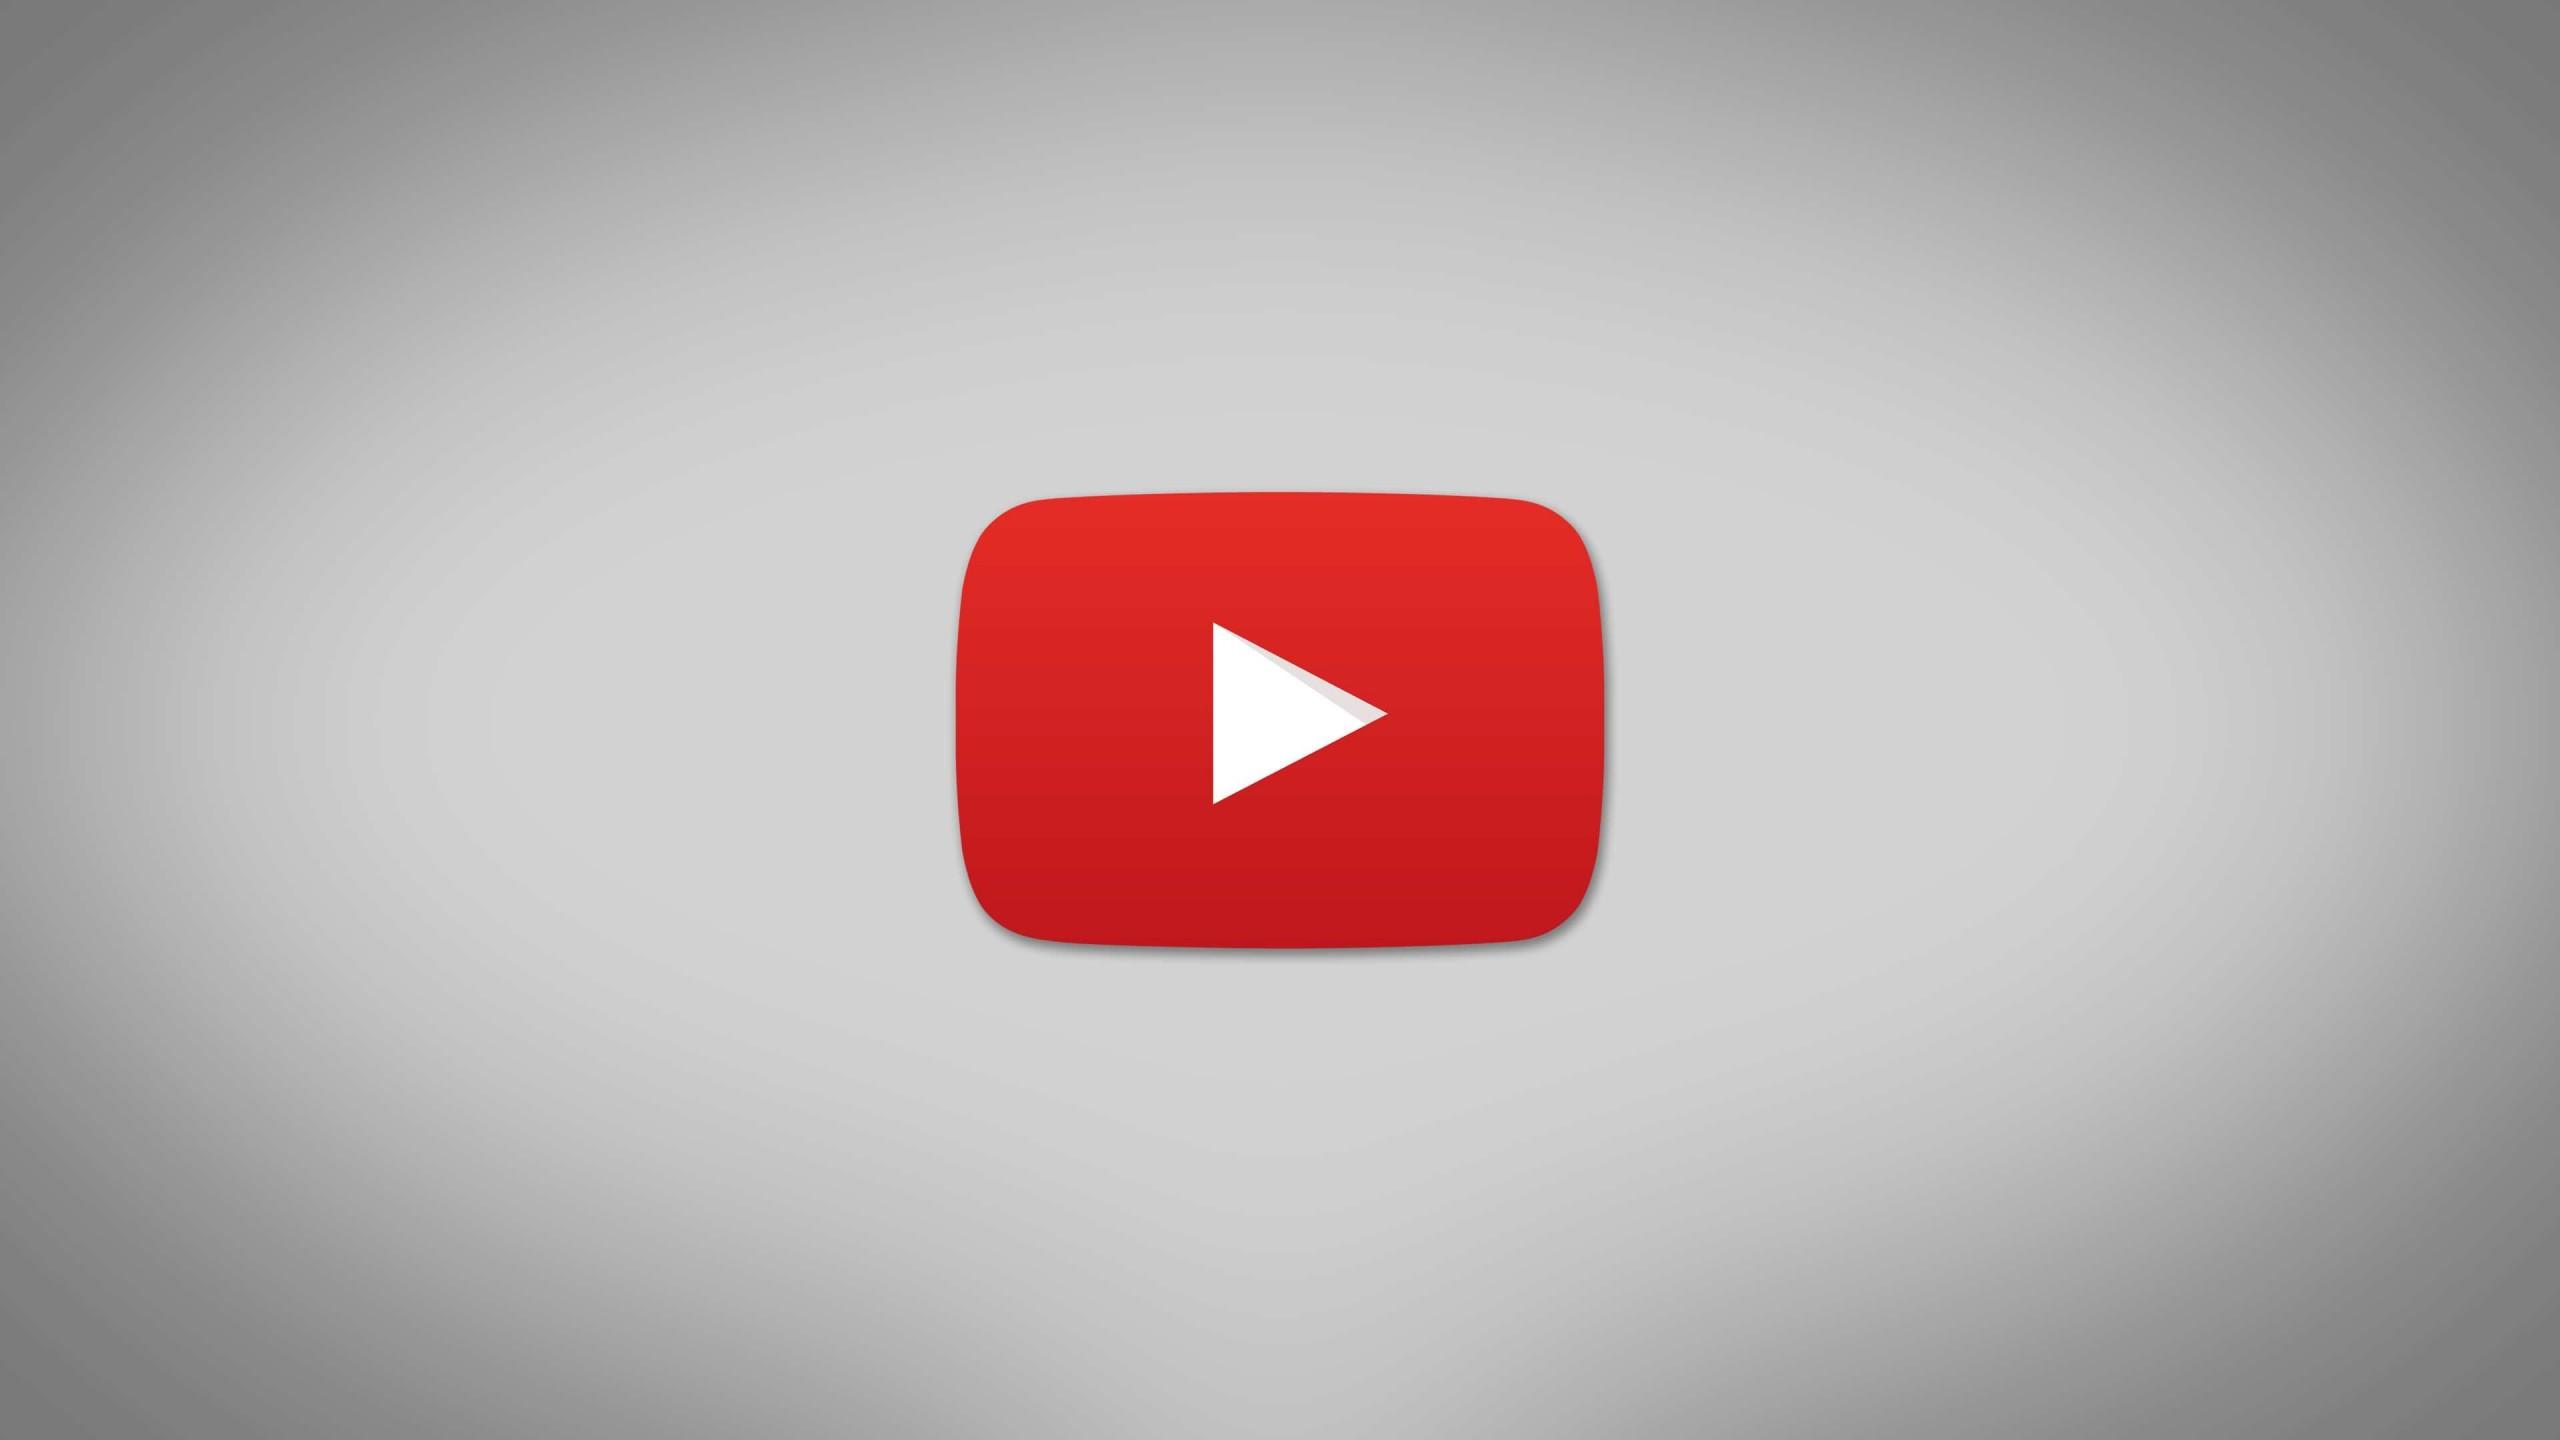 YouTube Logo HD wallpaper for 2560x1440 screens ...